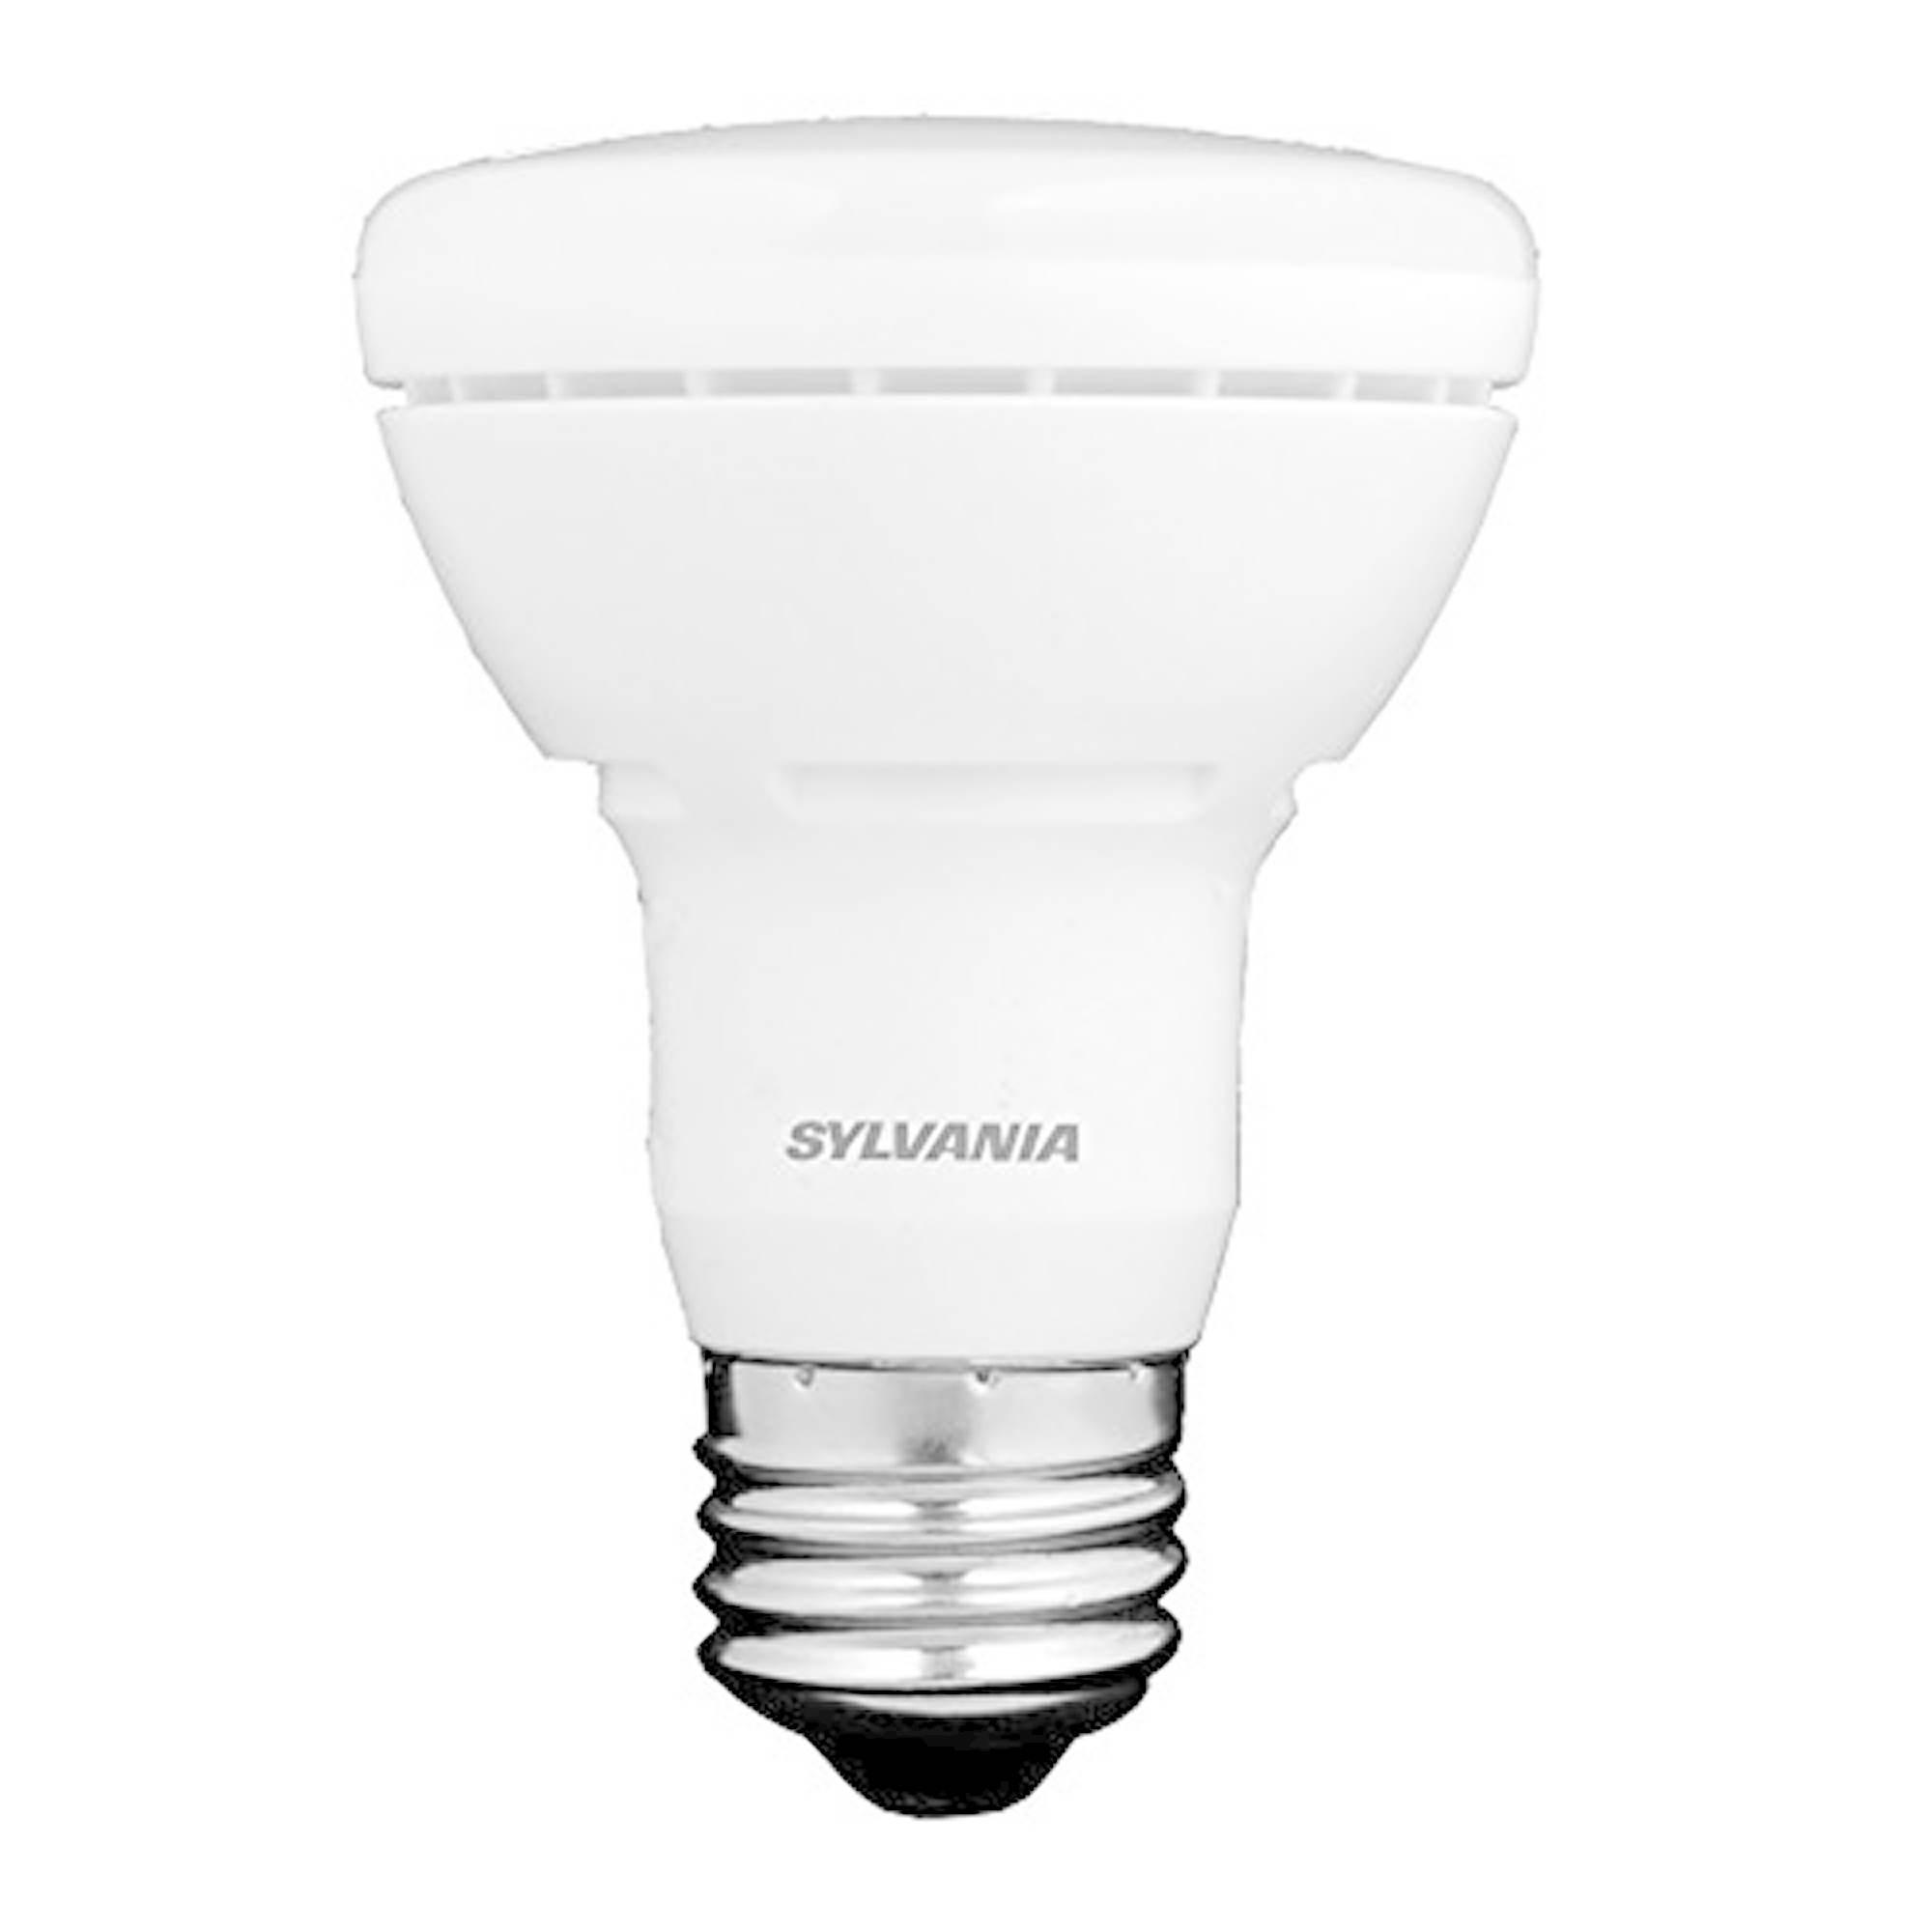 sylvania ultra 7w r20 medium base dimmable indoor led flood light bulb soft white bj 39 s. Black Bedroom Furniture Sets. Home Design Ideas